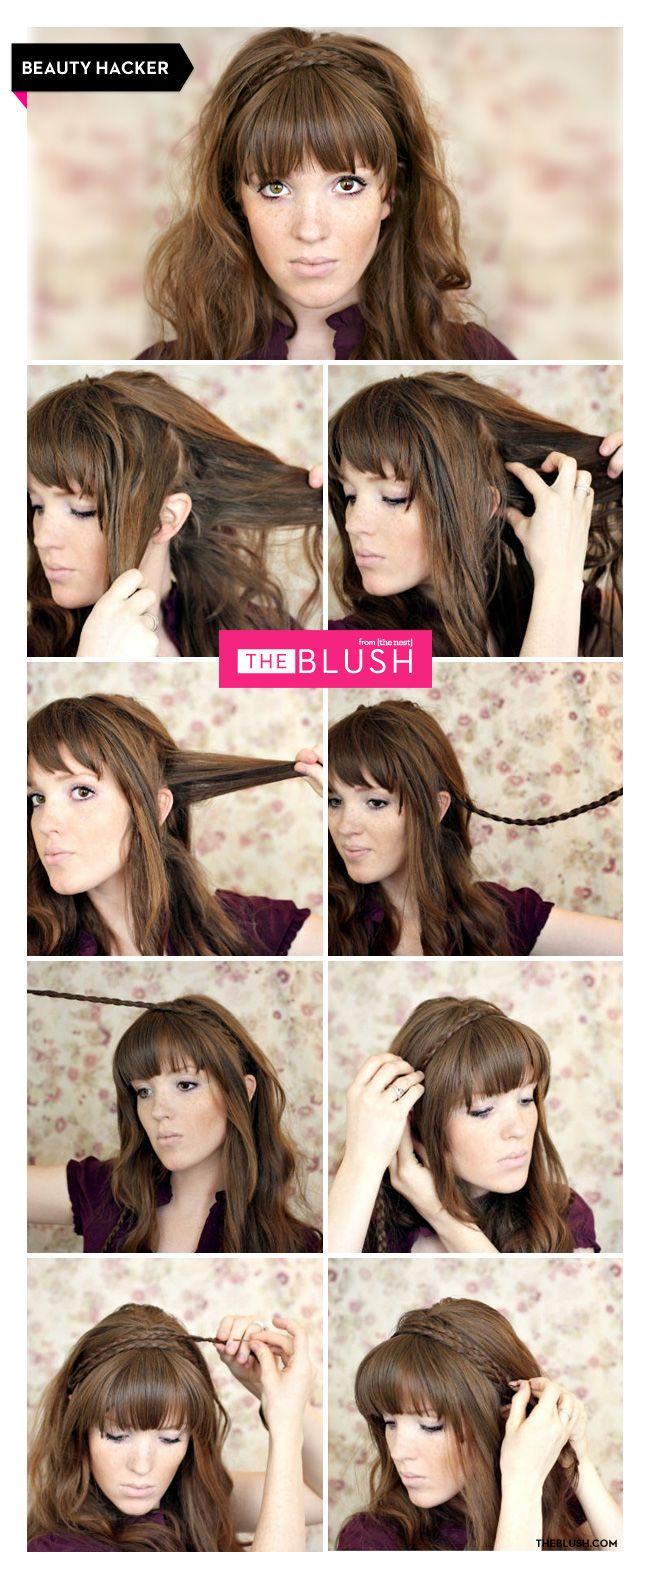 Hair Crush of the Day: The Braided Headband